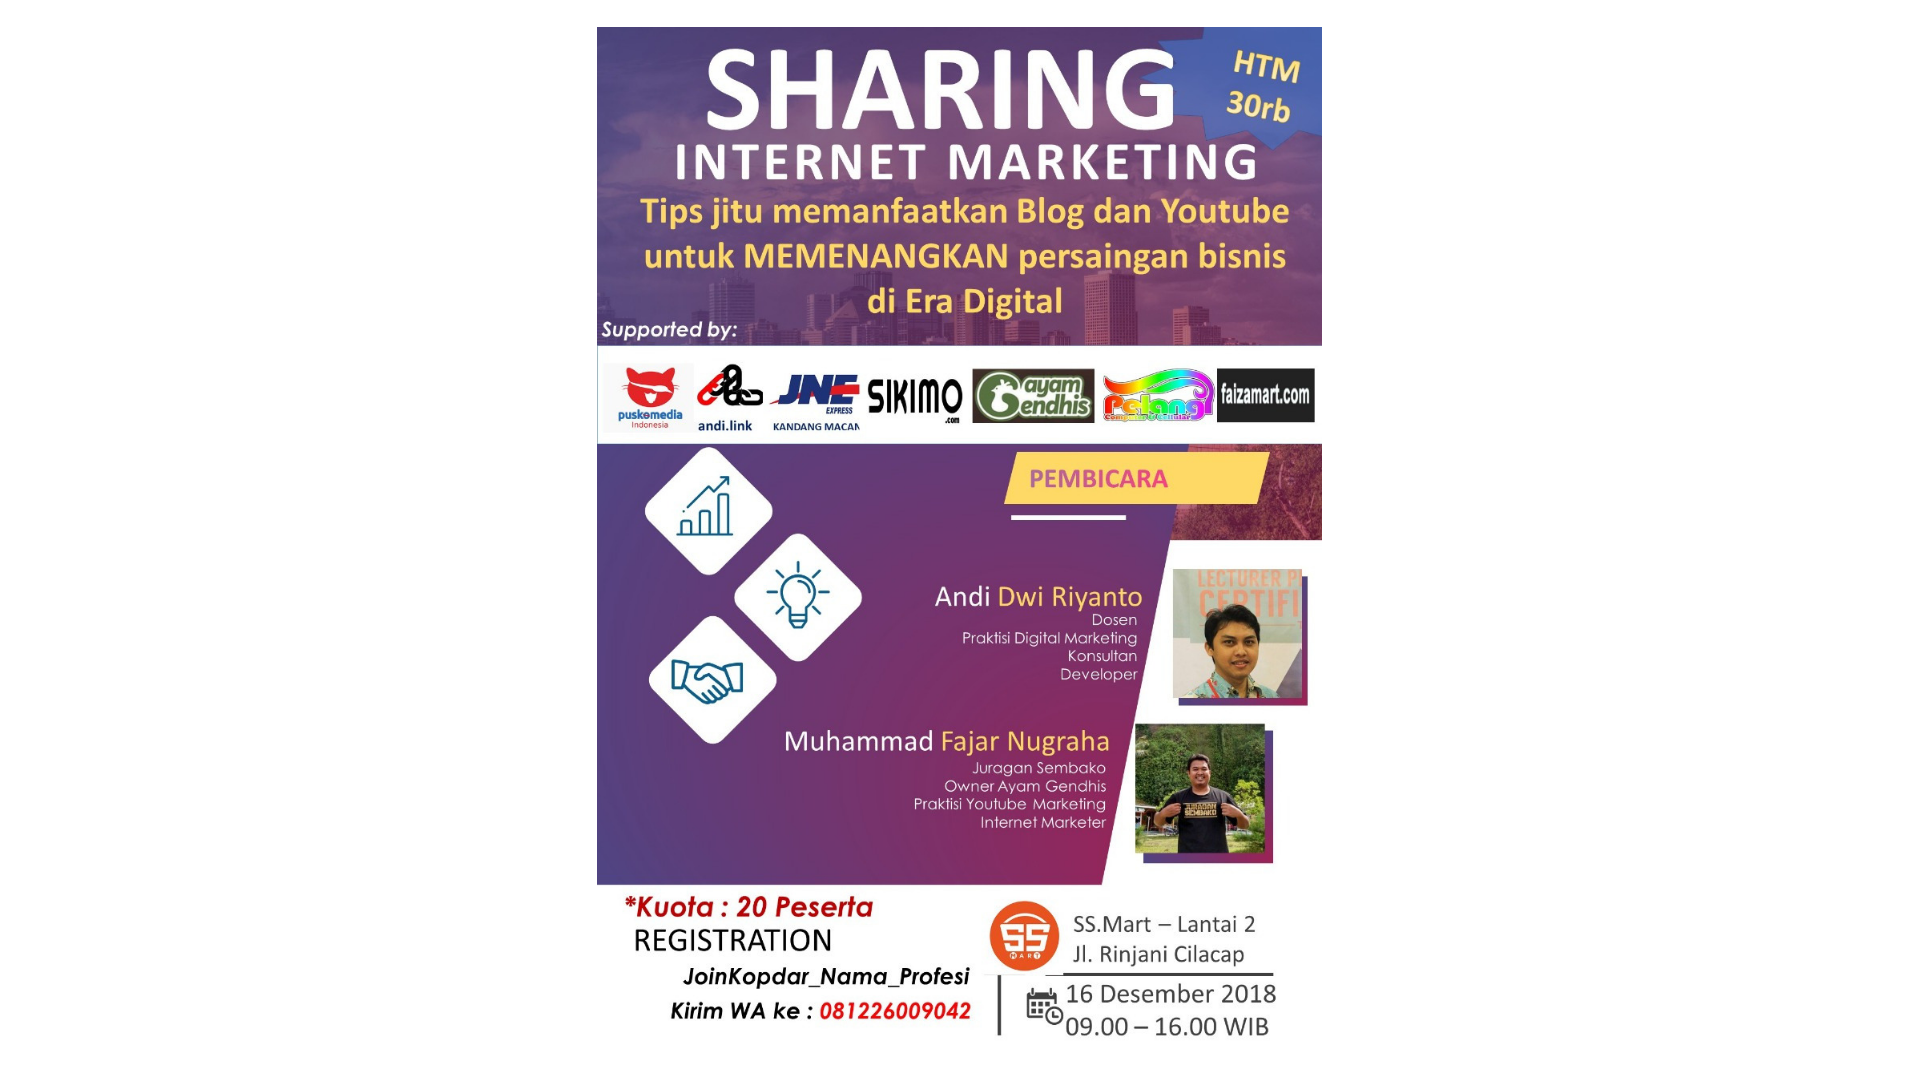 Sharing Internet Marketing Cilacap